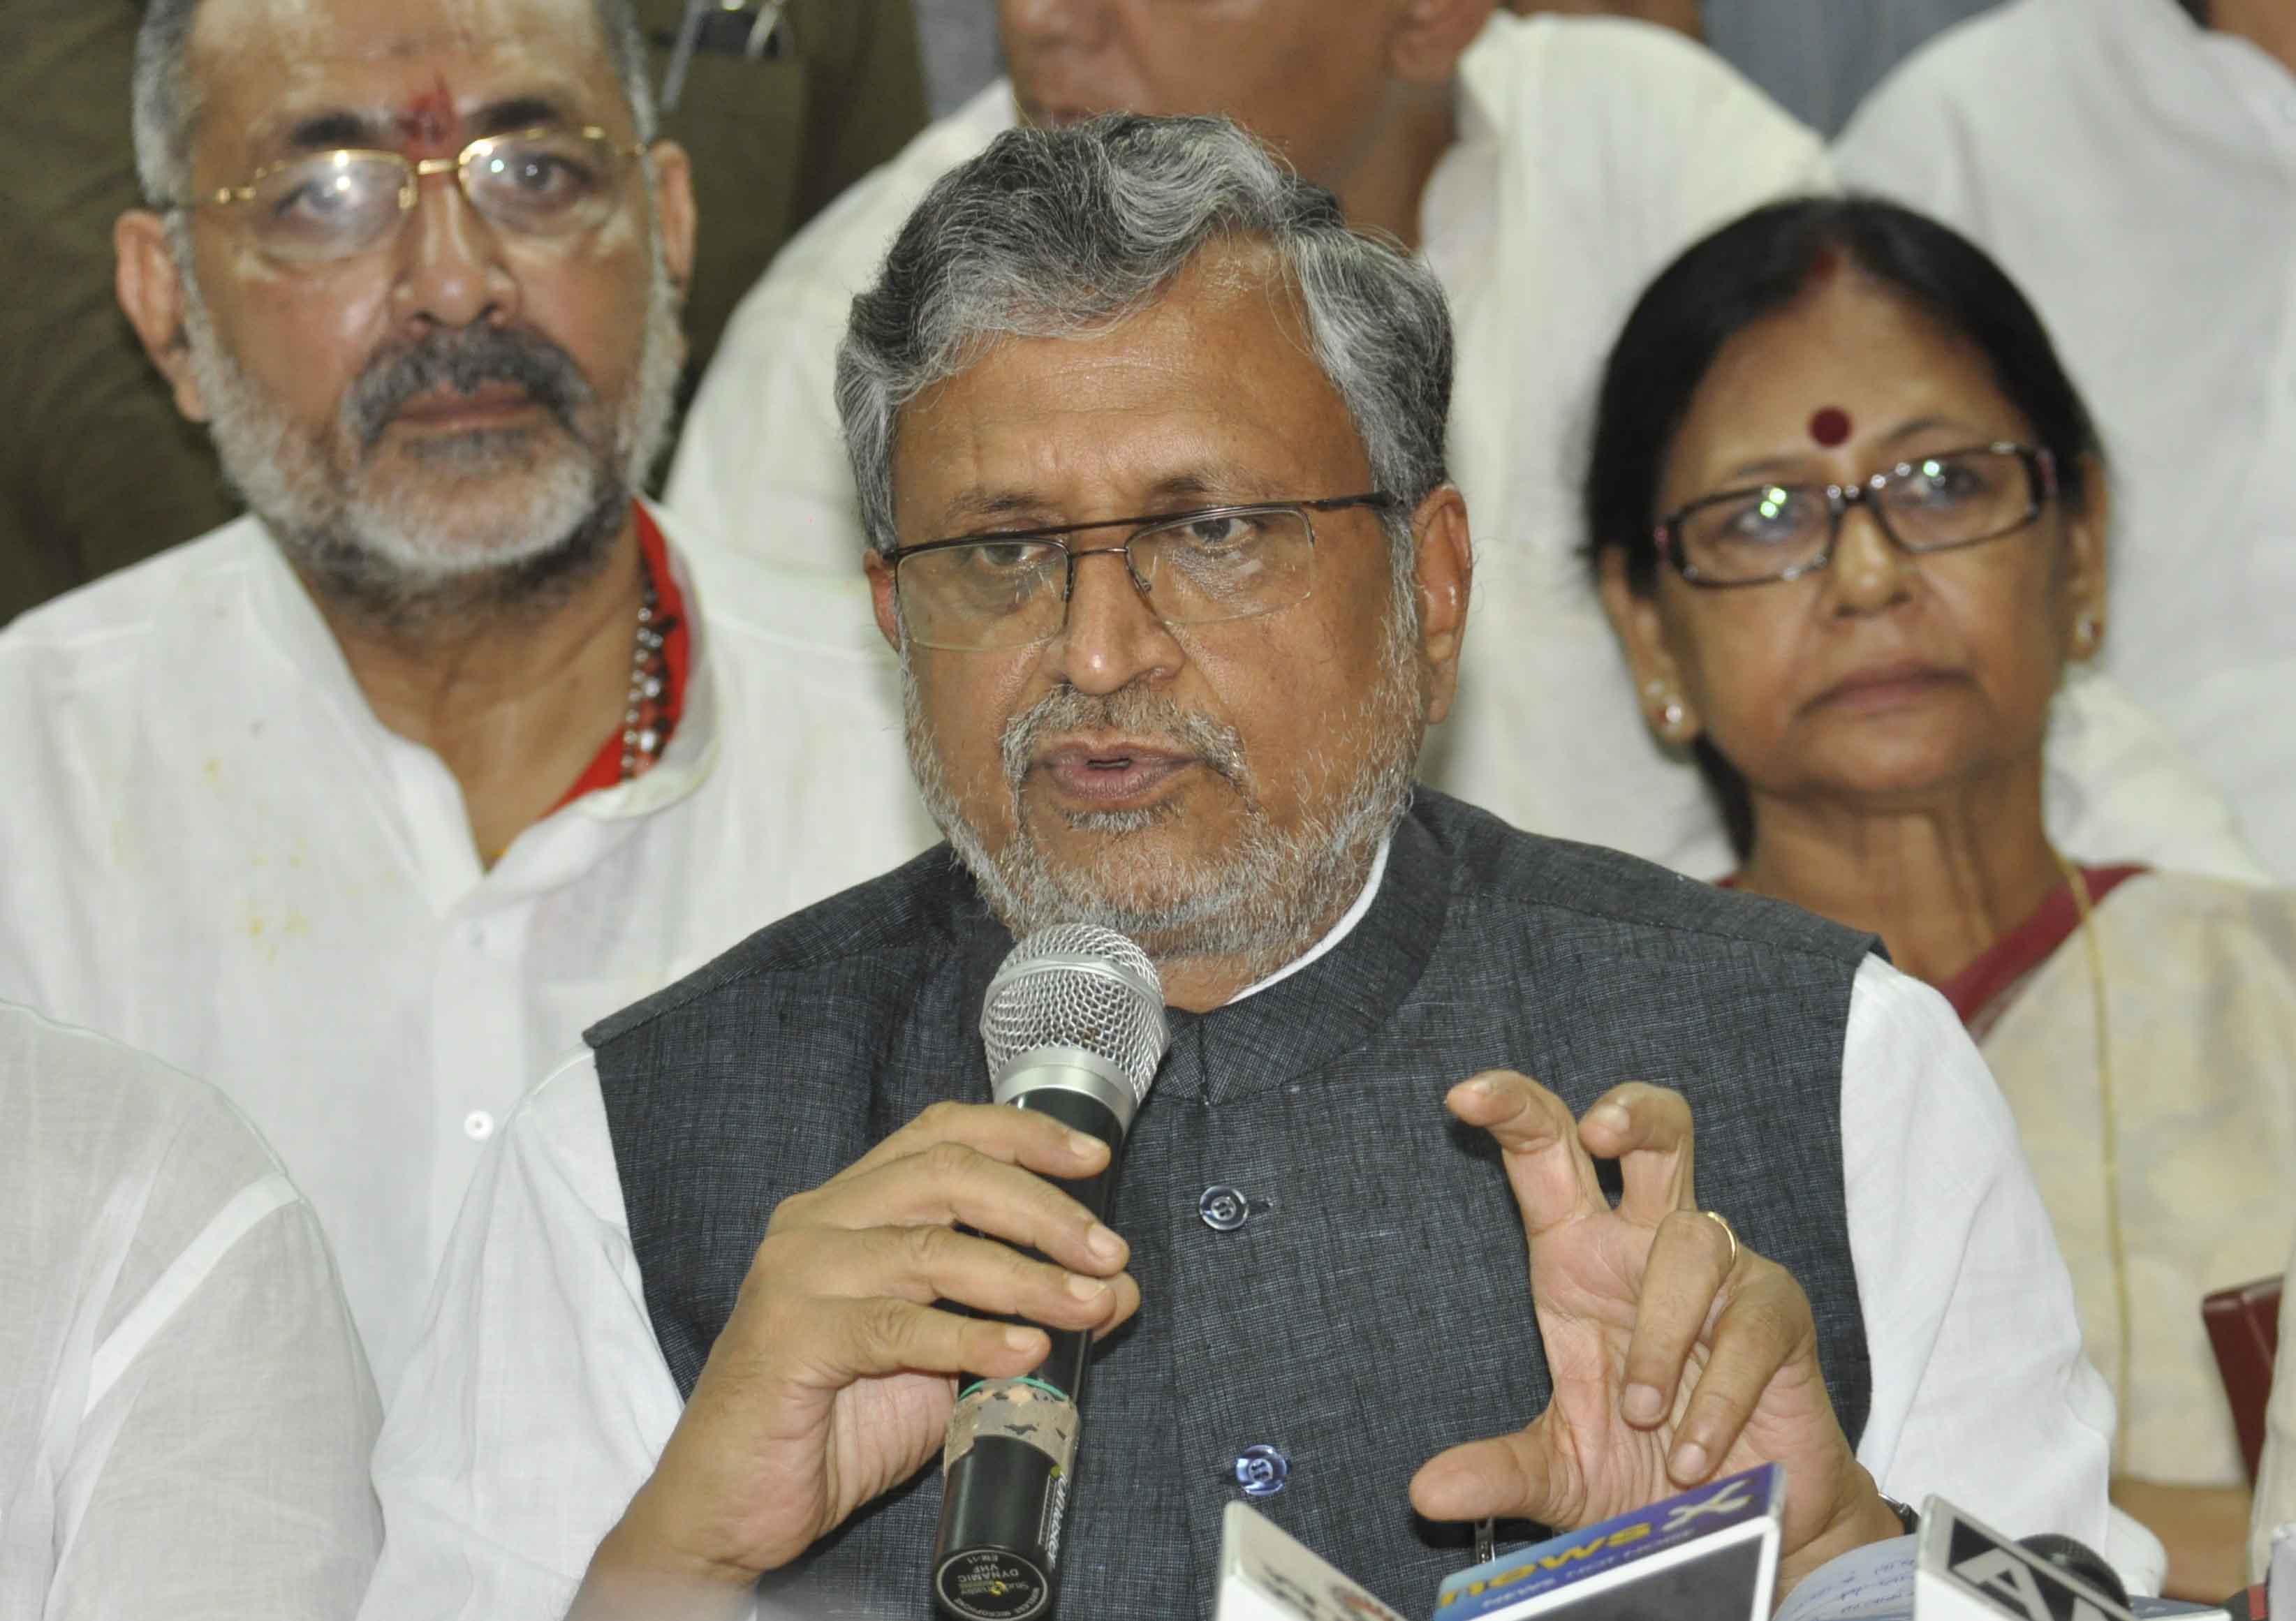 Sushil Kumar Modi: Bihar CM's visit to London for investment useless